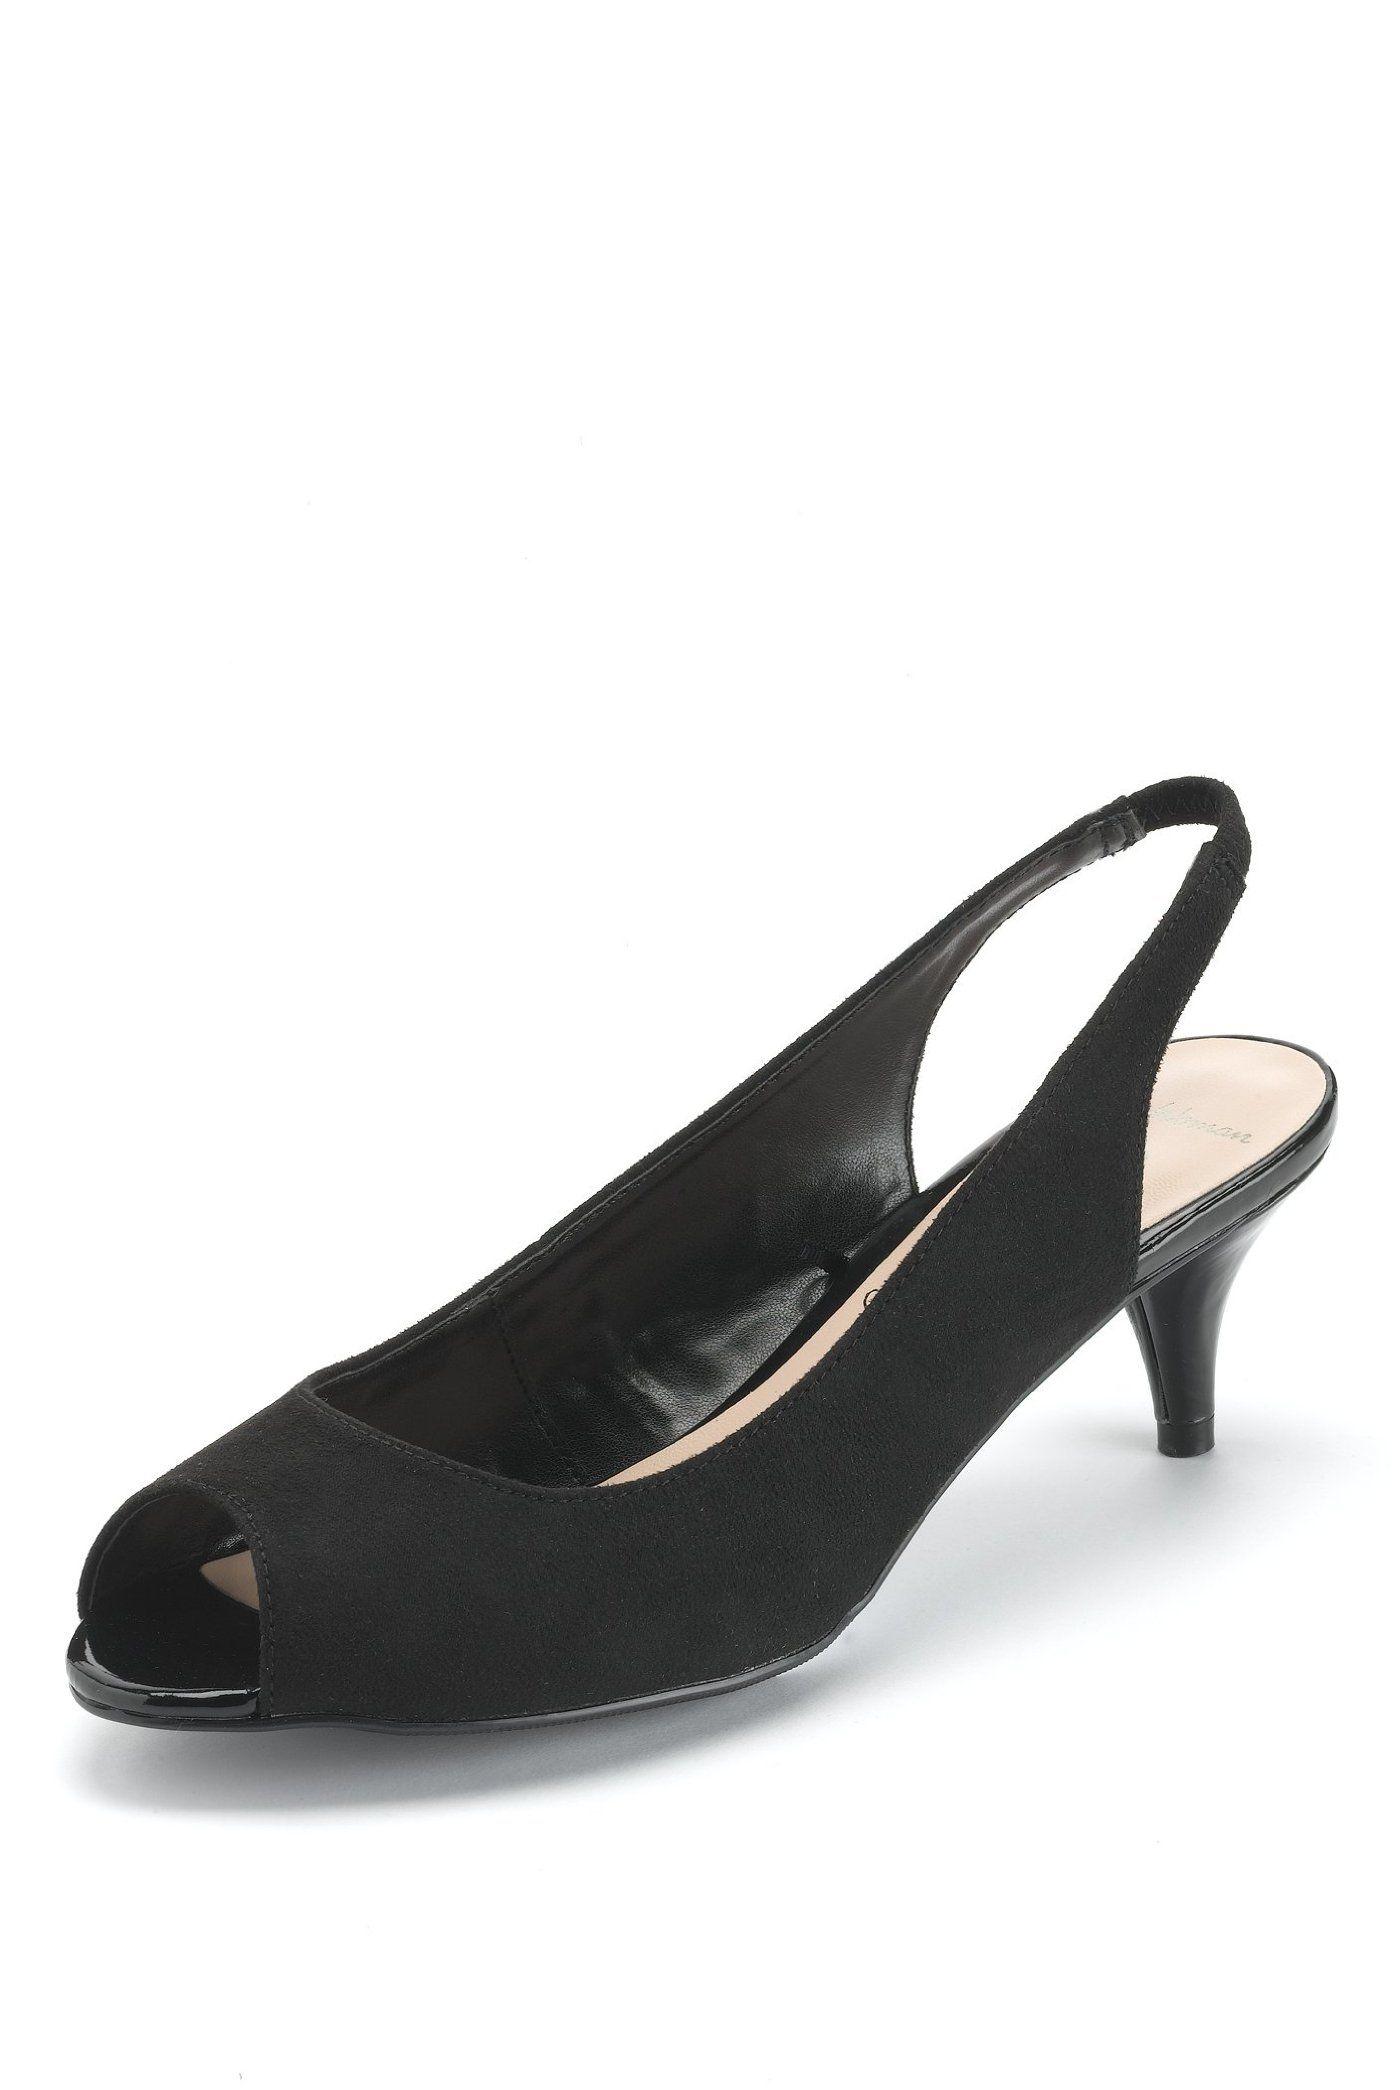 MS Peep Toe Stiletto Slingback with